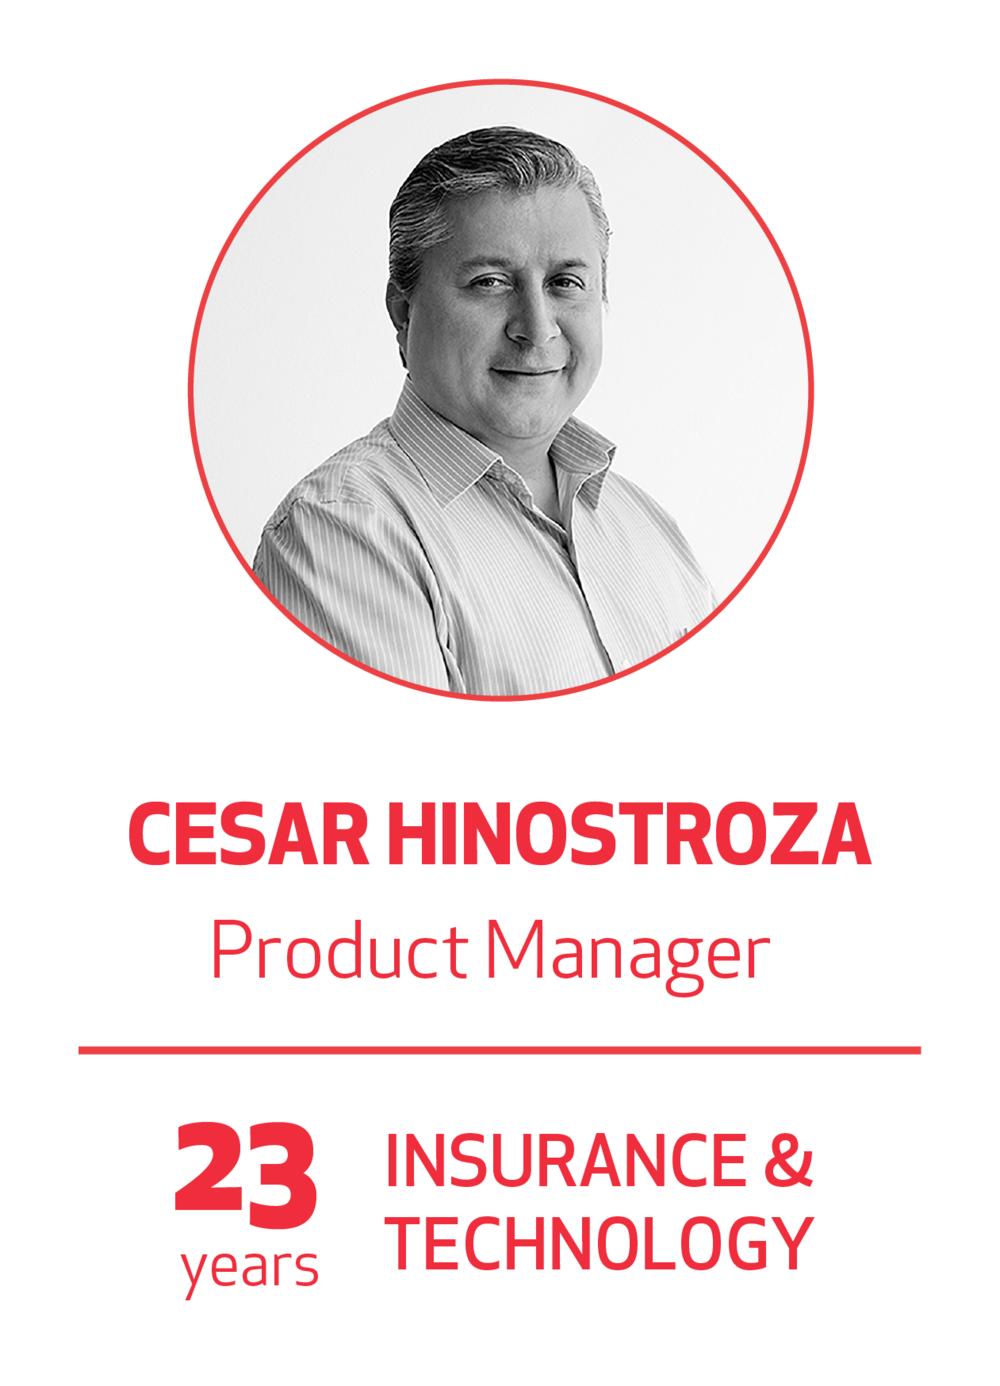 Cesar Hinostroza